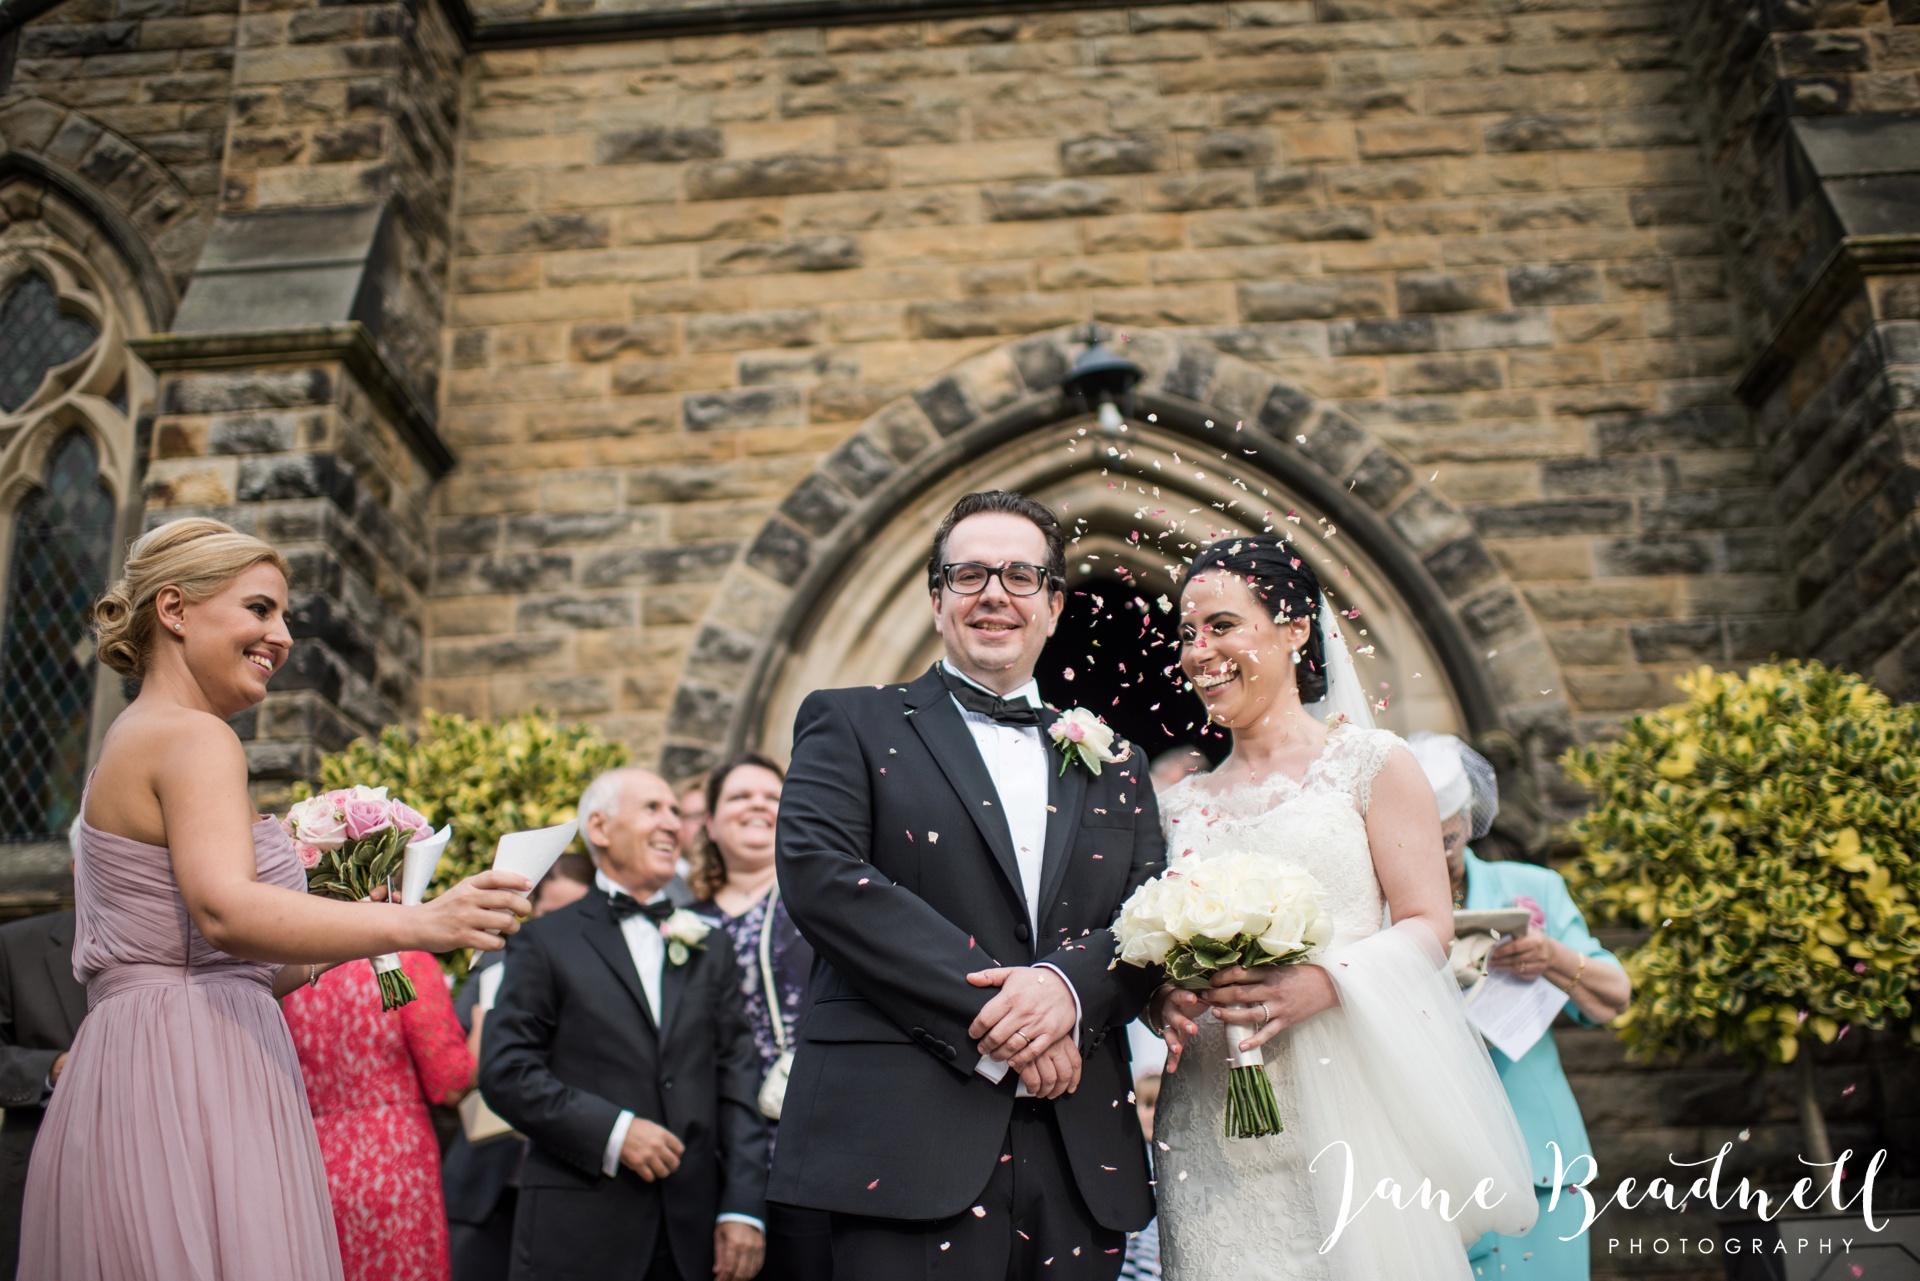 Jane Beadnell fine art wedding photographer Rudding Park Harrogate_0034